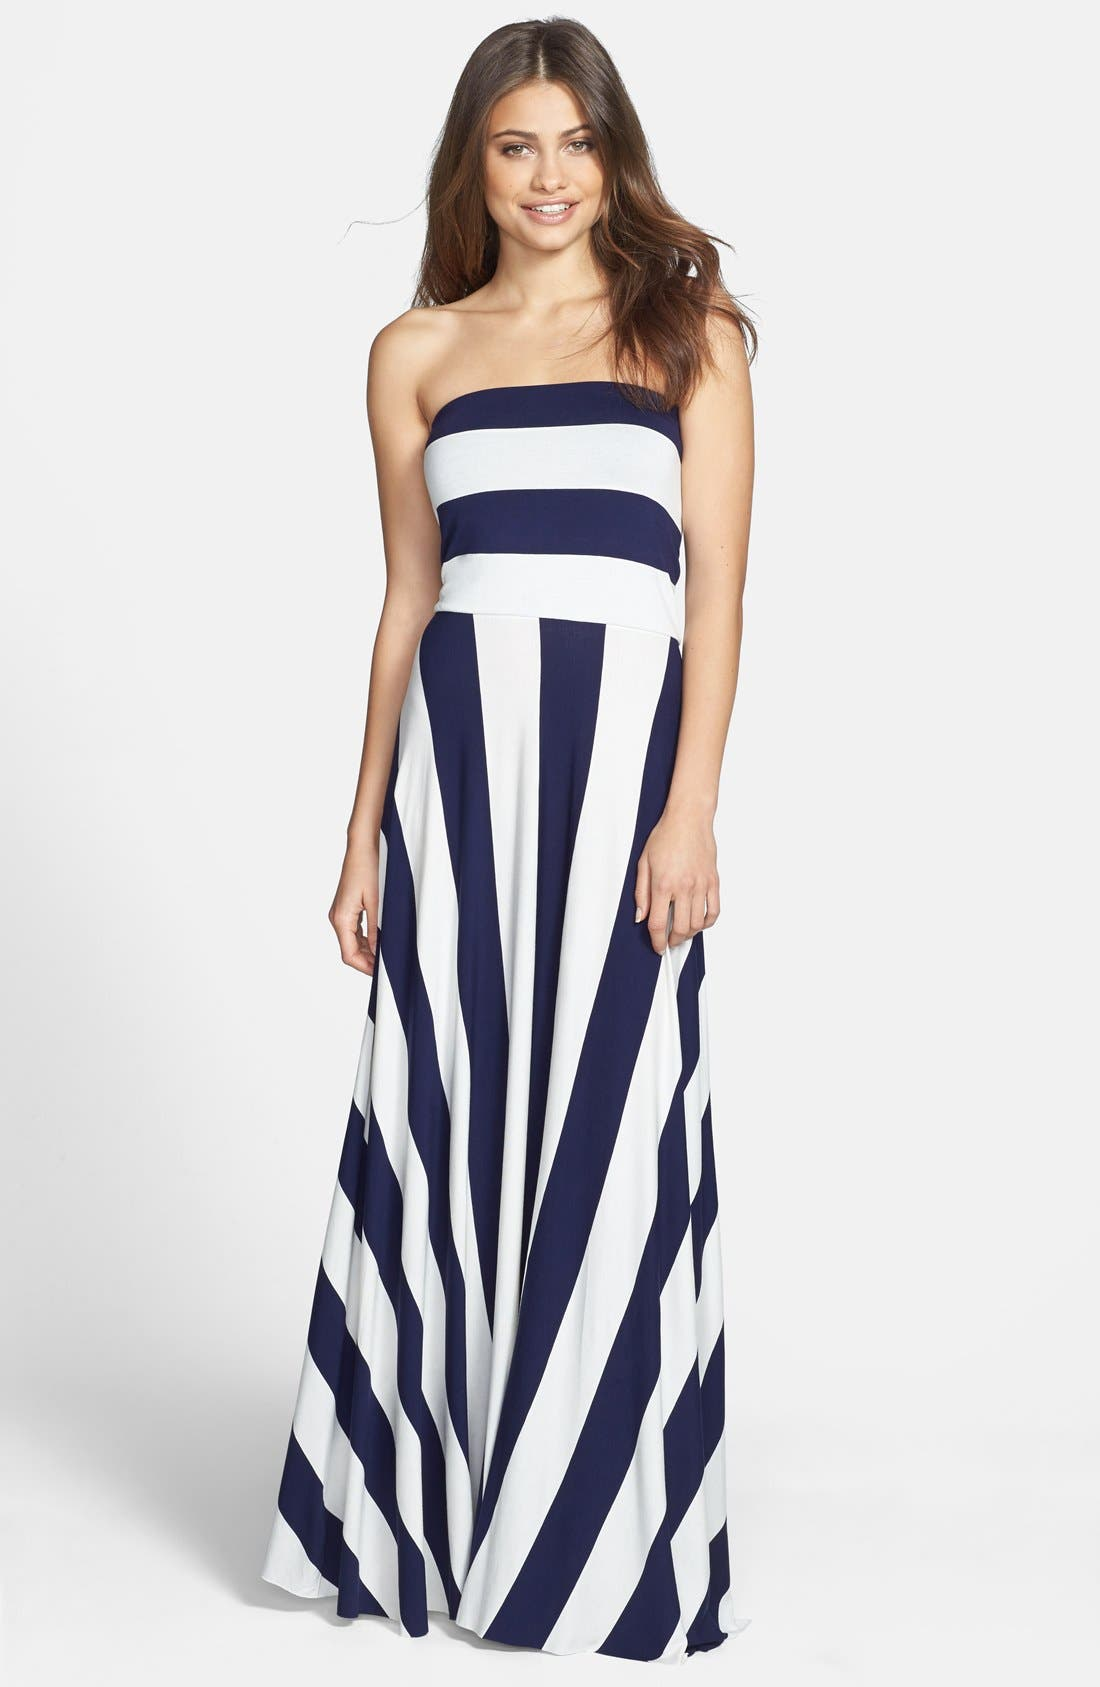 Alternate Image 1 Selected - Elan Stripe Convertible Bias Cut Cover-Up Maxi Dress